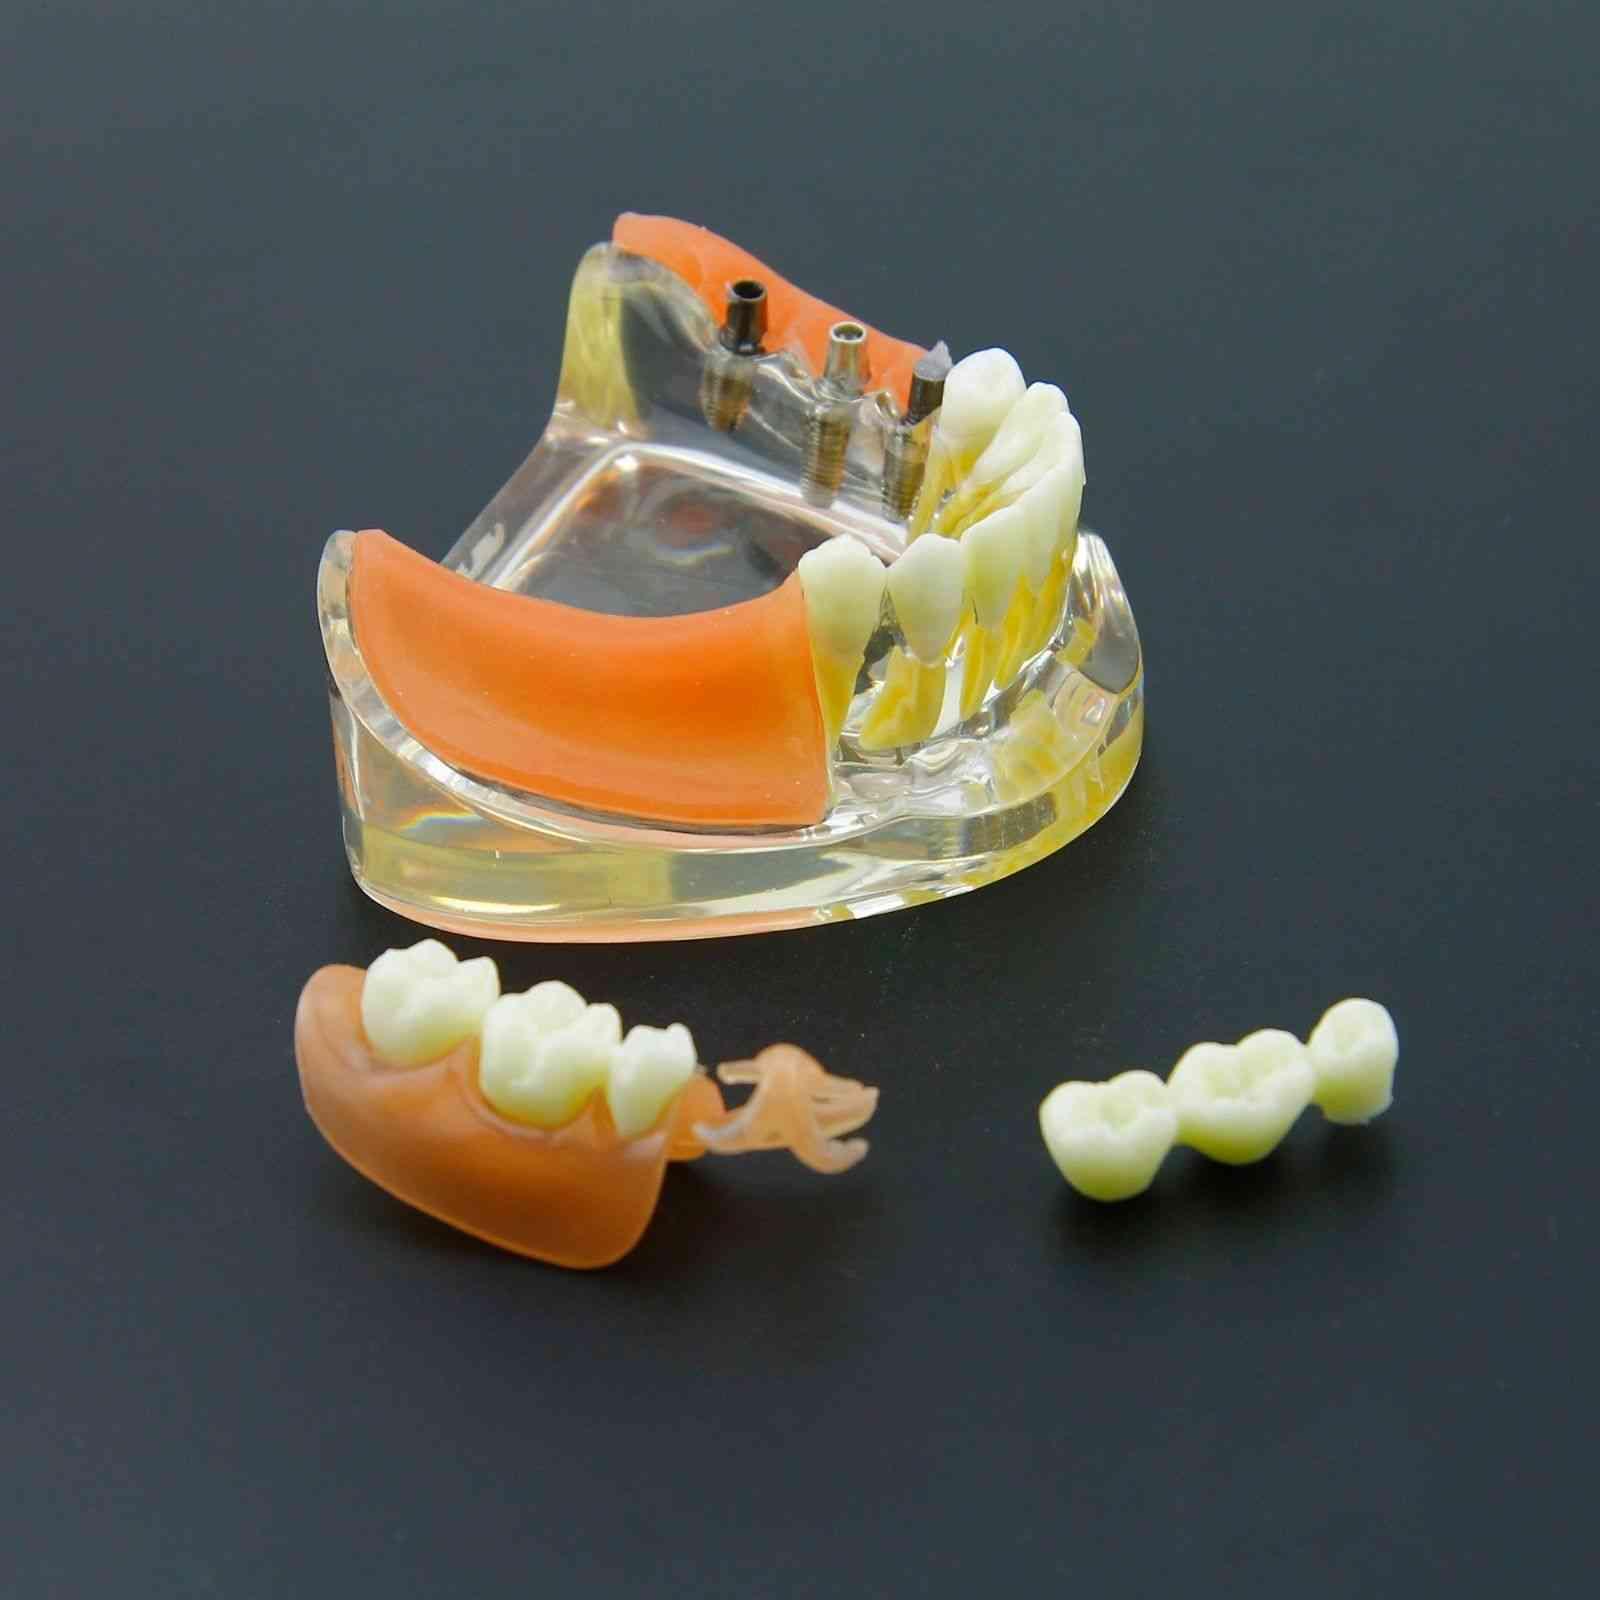 Dental Implant Restoration Teeth Model - Removable Bridge Denture Demo